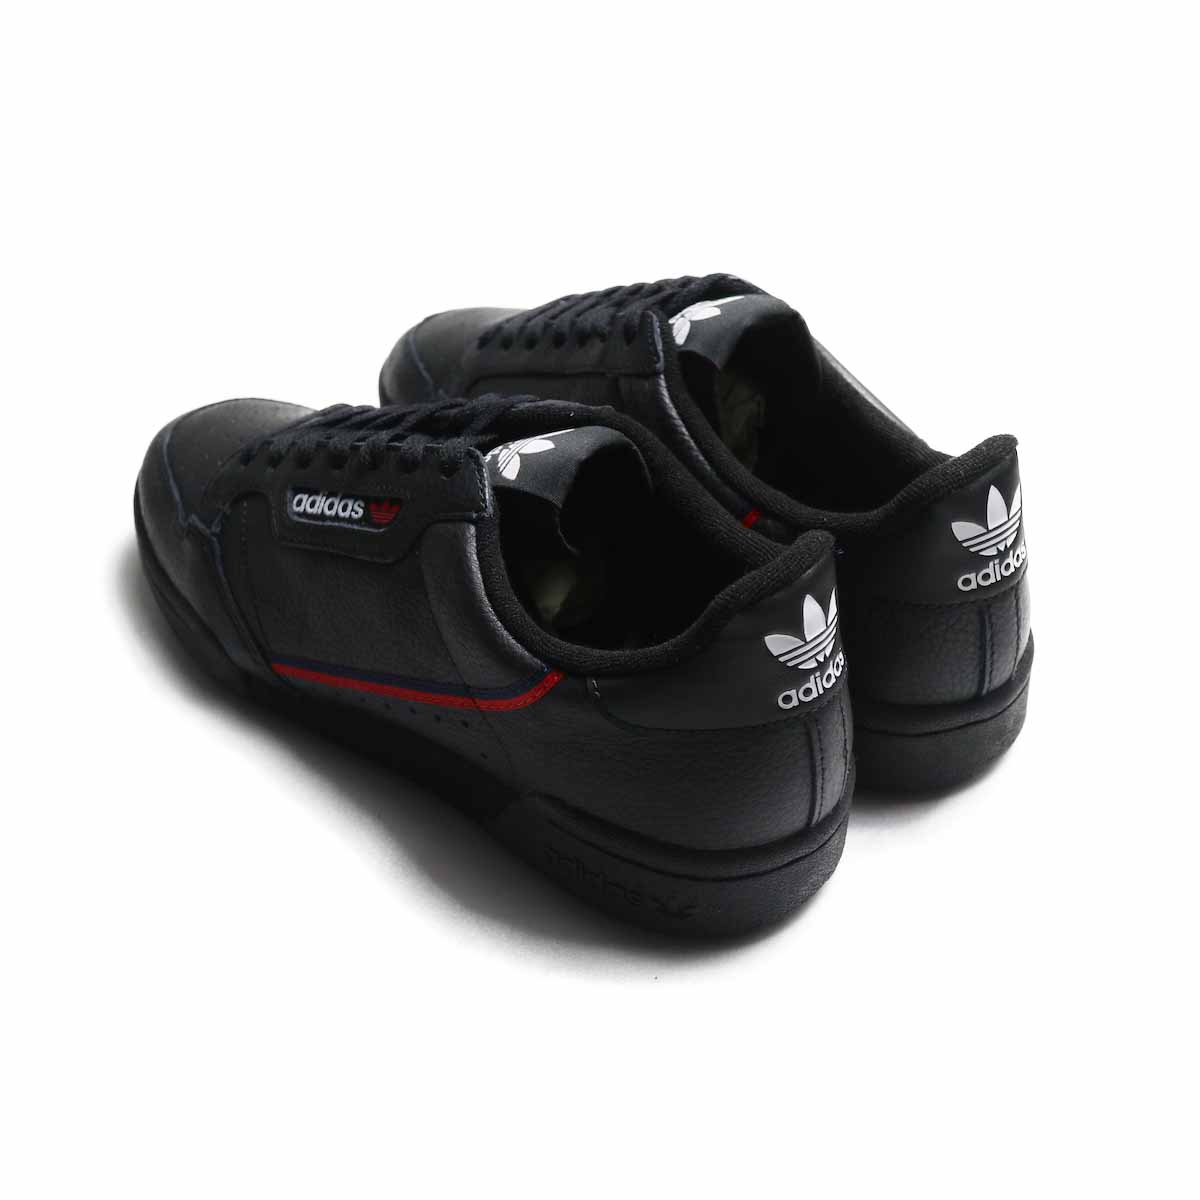 adidas originals / CONTINENTAL80 (G27707) -Black 背面